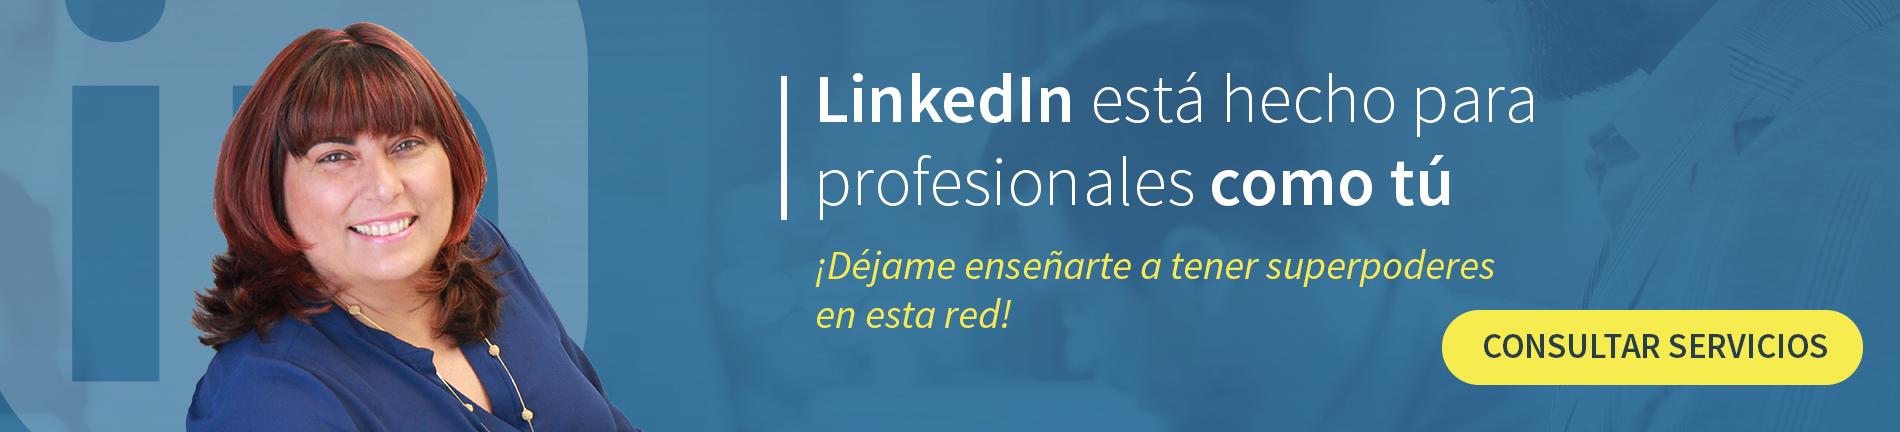 LinkedIn profesionales